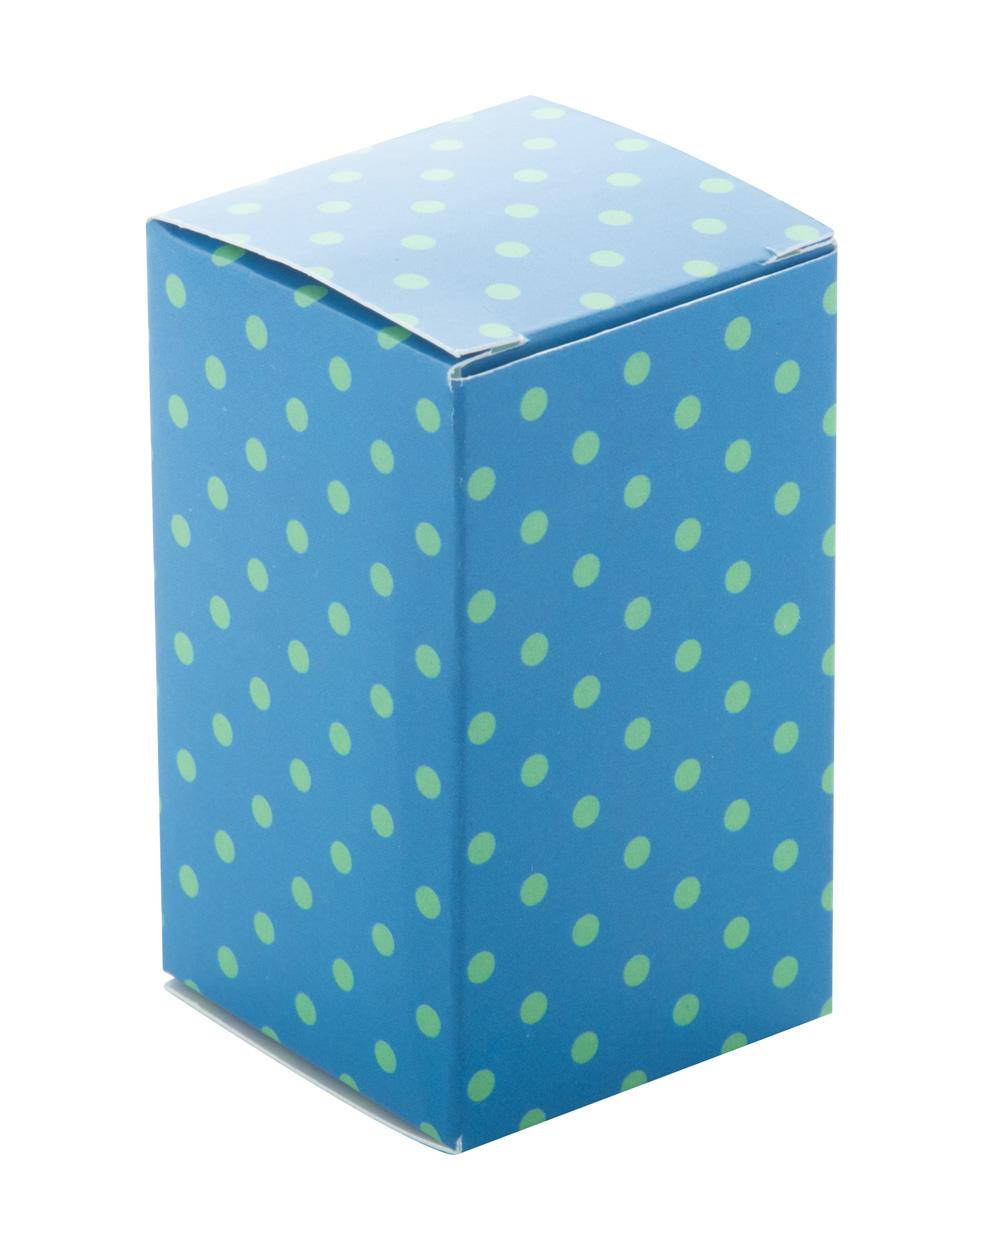 CreaBox Charger B custom box